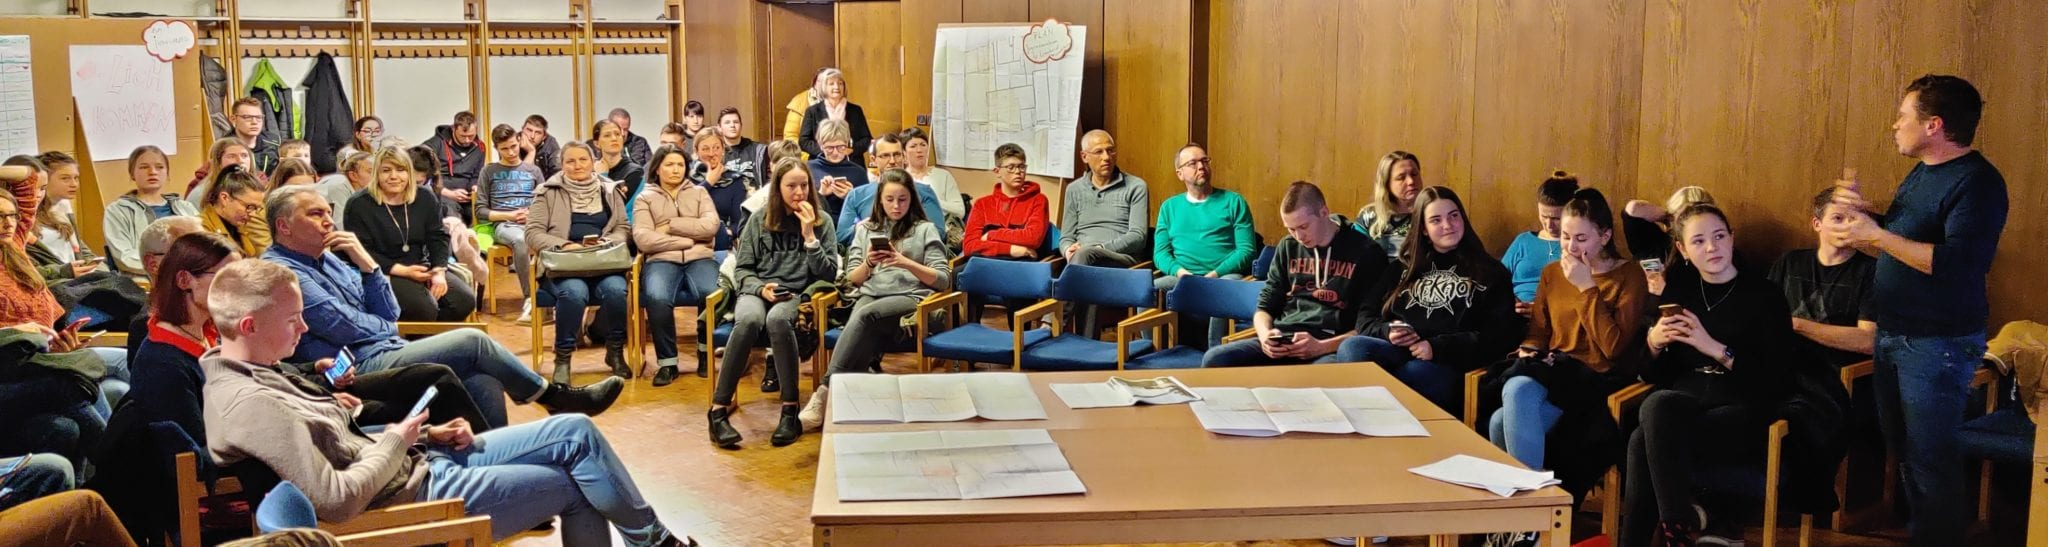 Infoabend Jugendzentrum St.Leonhard